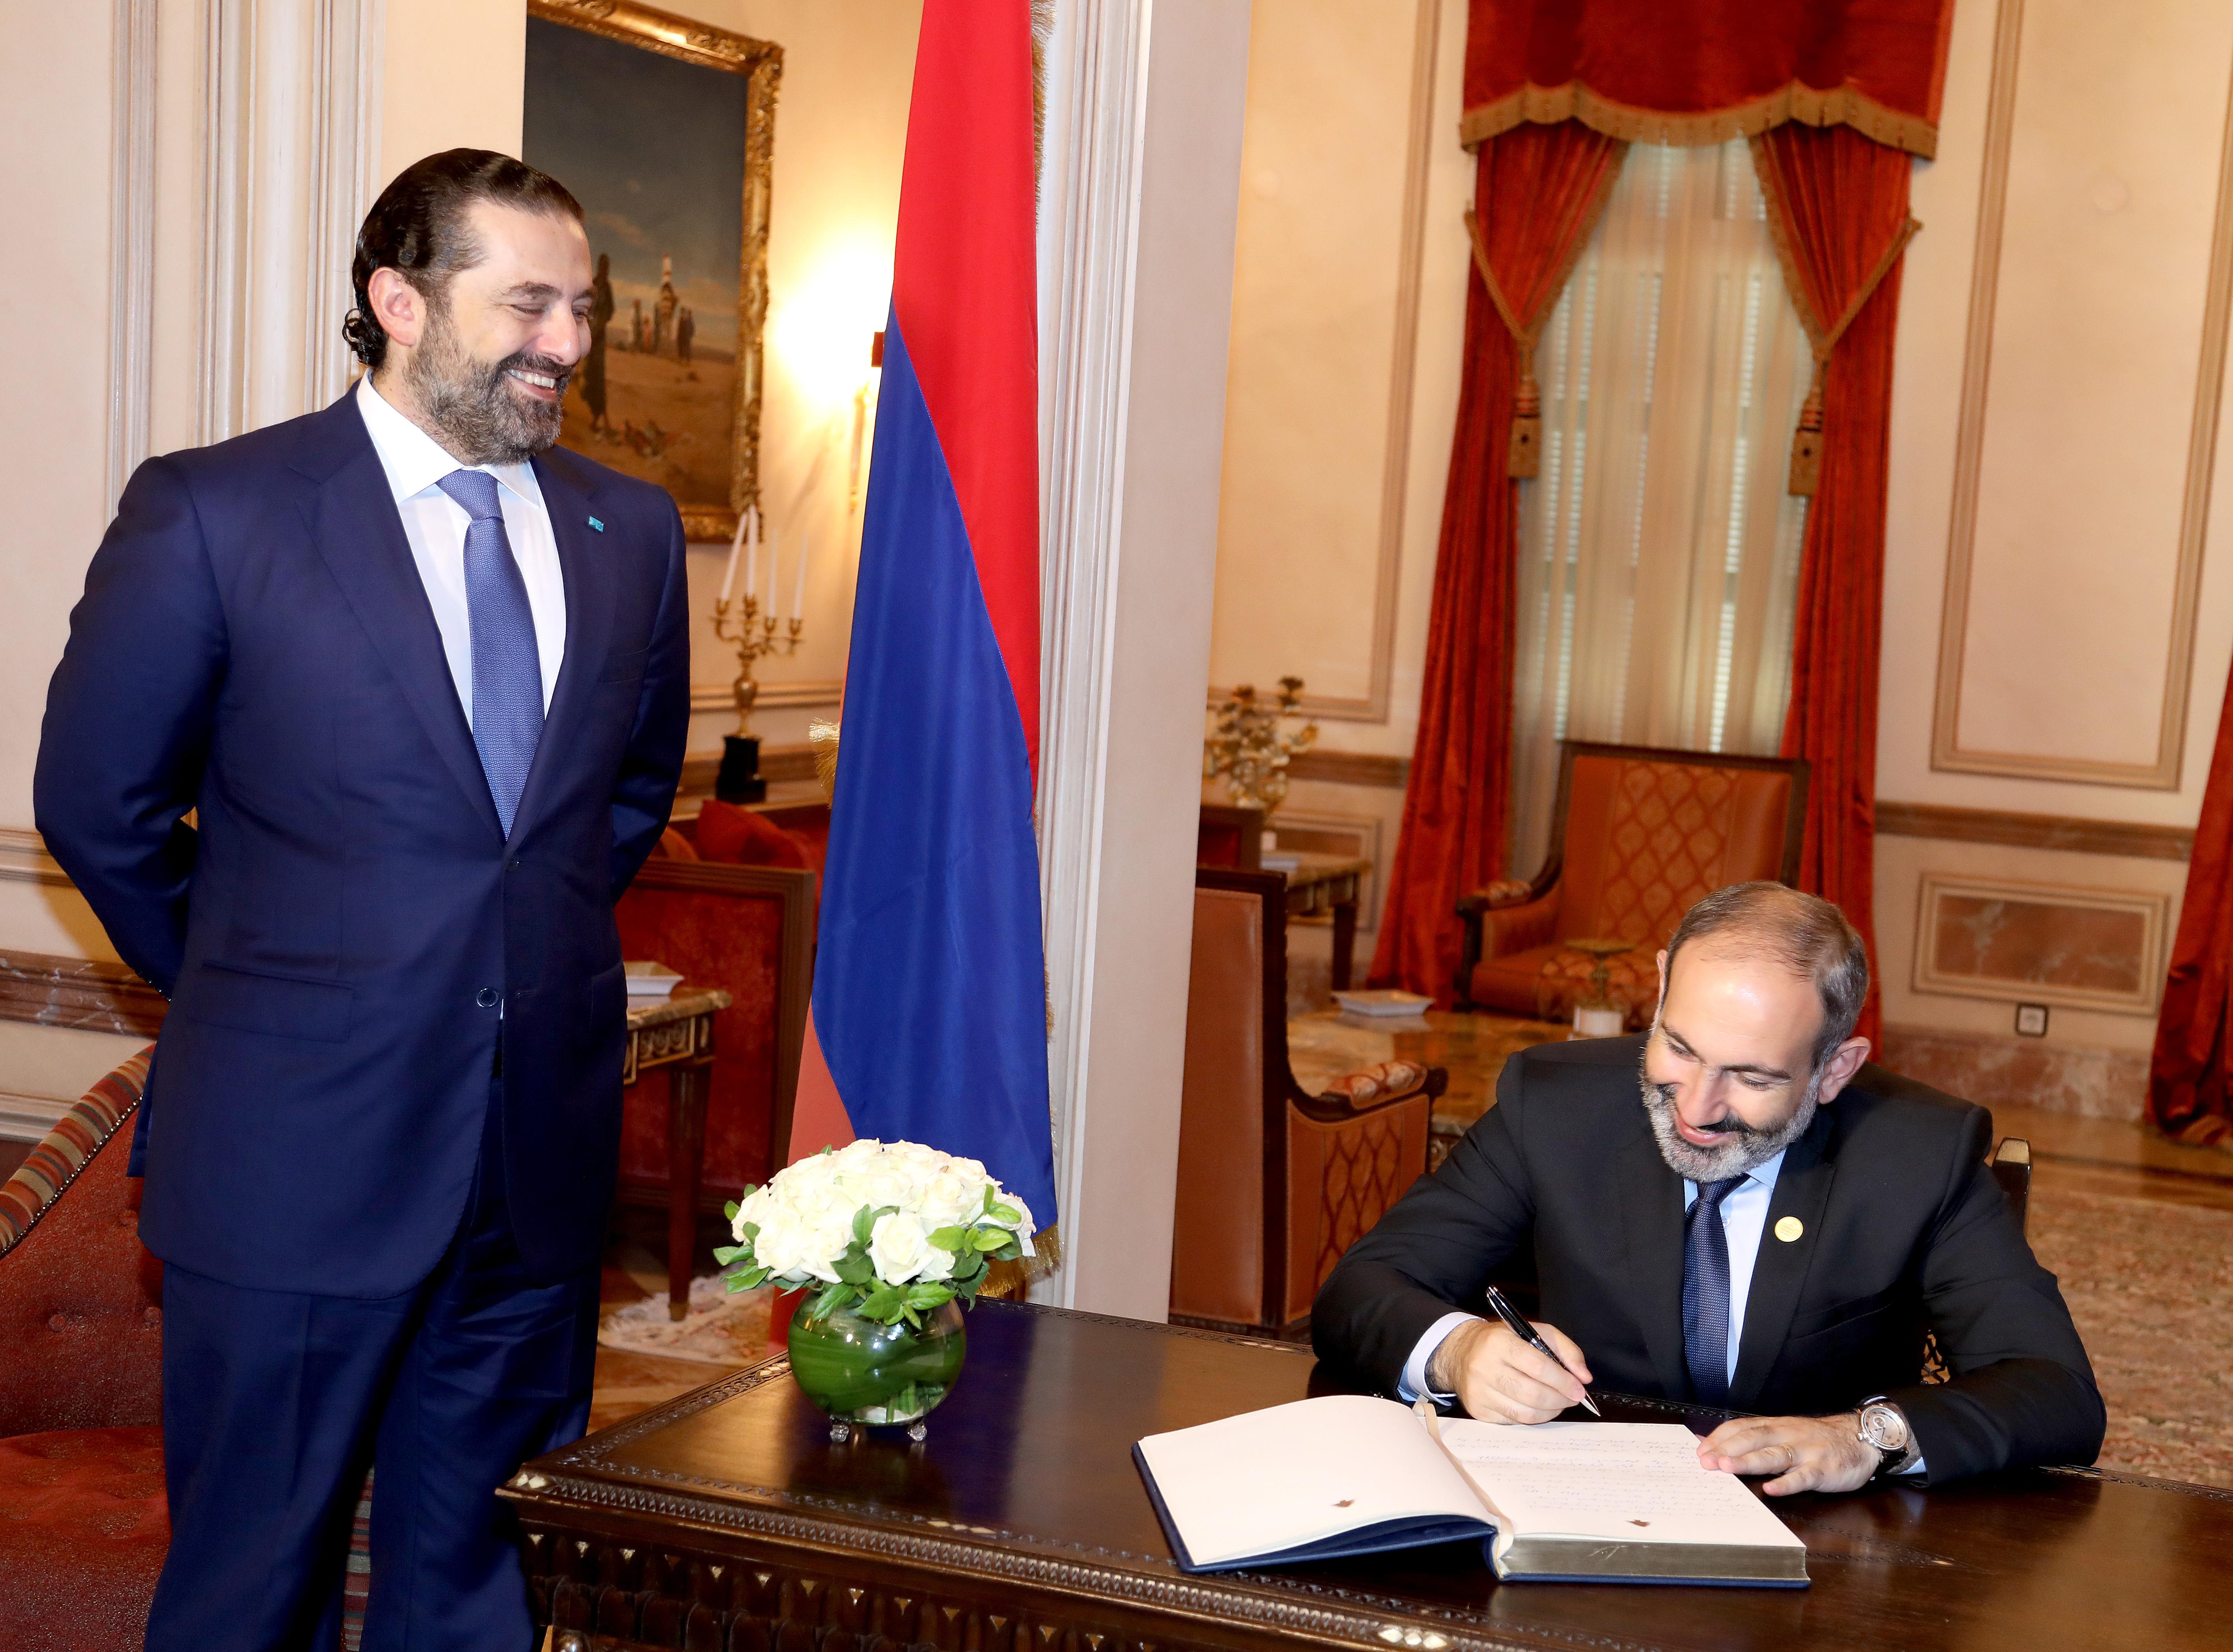 Pr Minister Saad Hariri meets Armenian Pr Minister 4